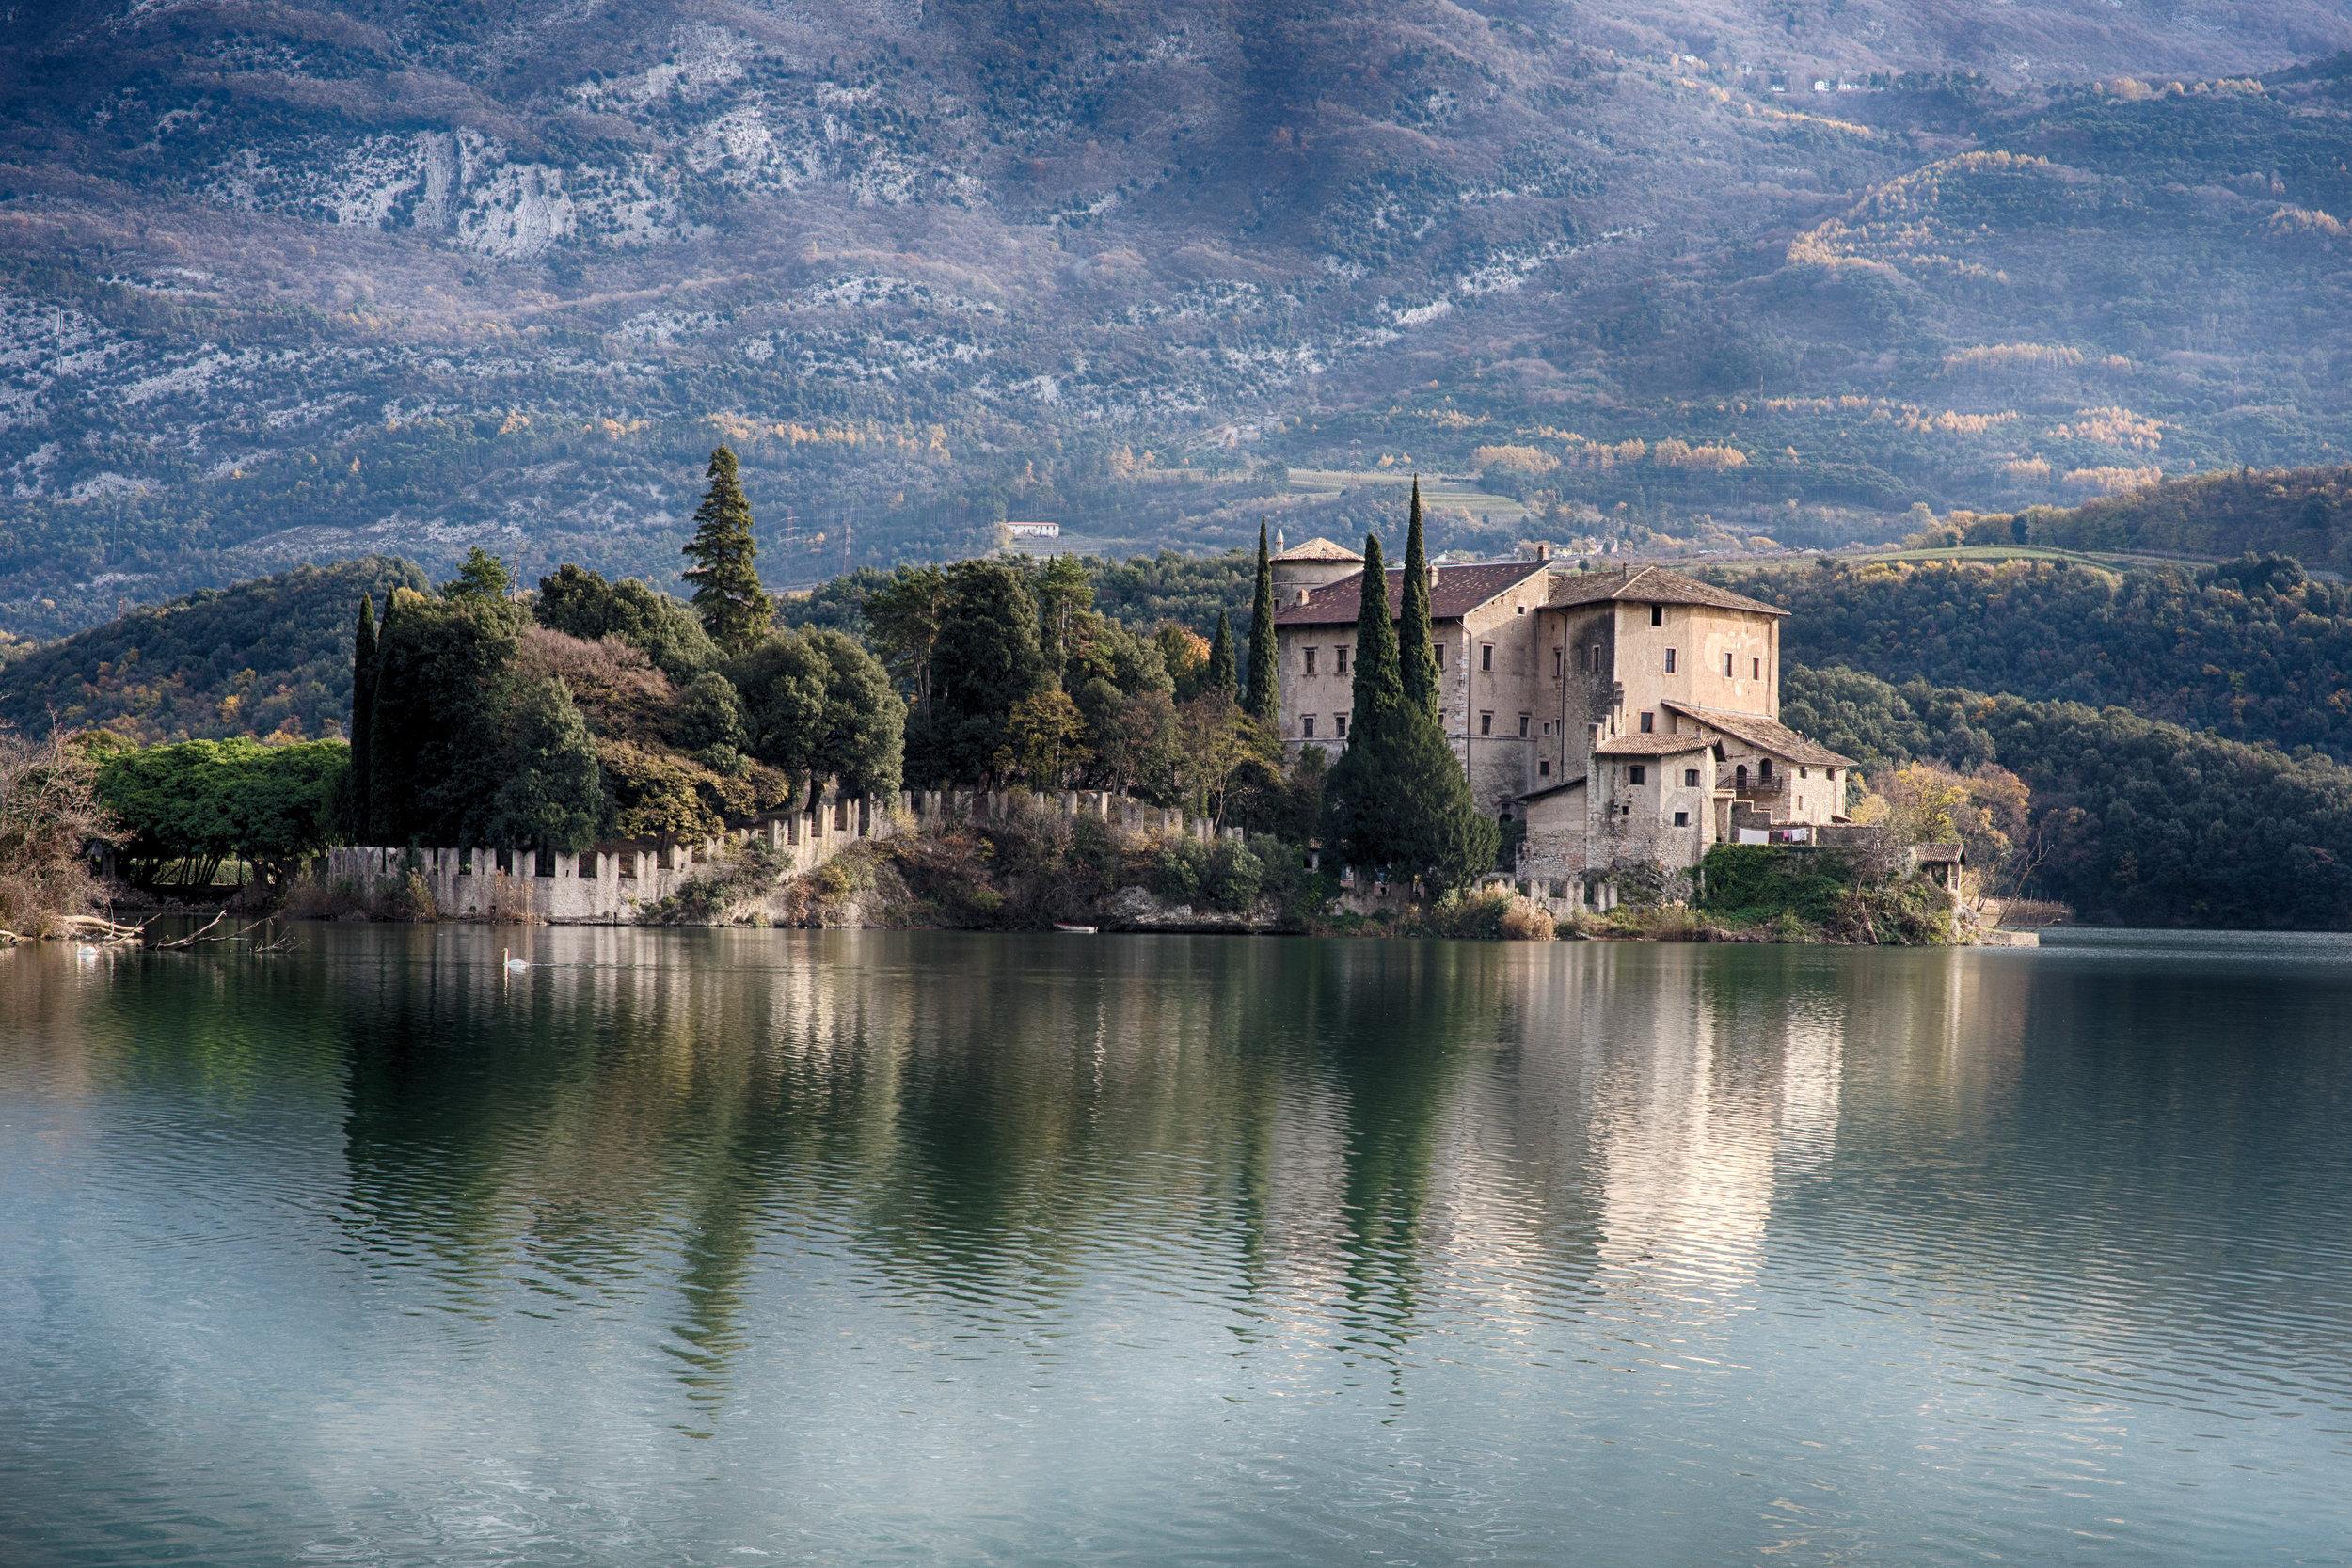 toblino castle view on winter day